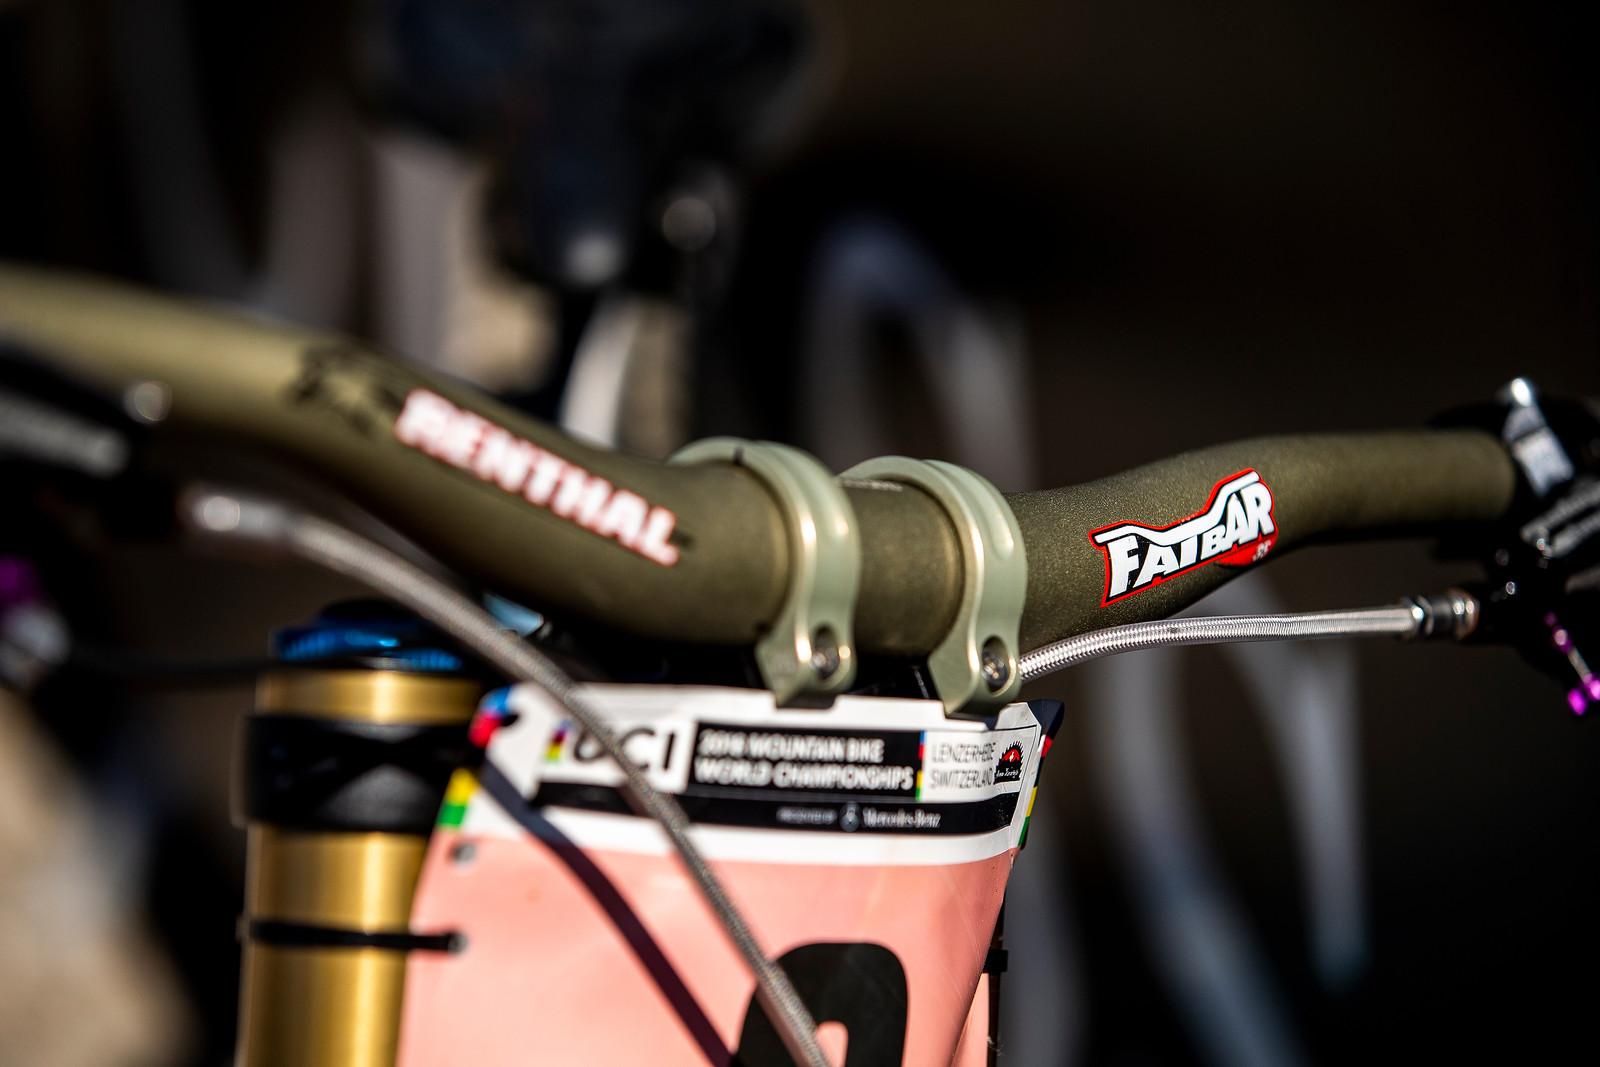 Renthal Cockpit - WINNING BIKE - Rachel Atherton's Trek Session - Mountain Biking Pictures - Vital MTB